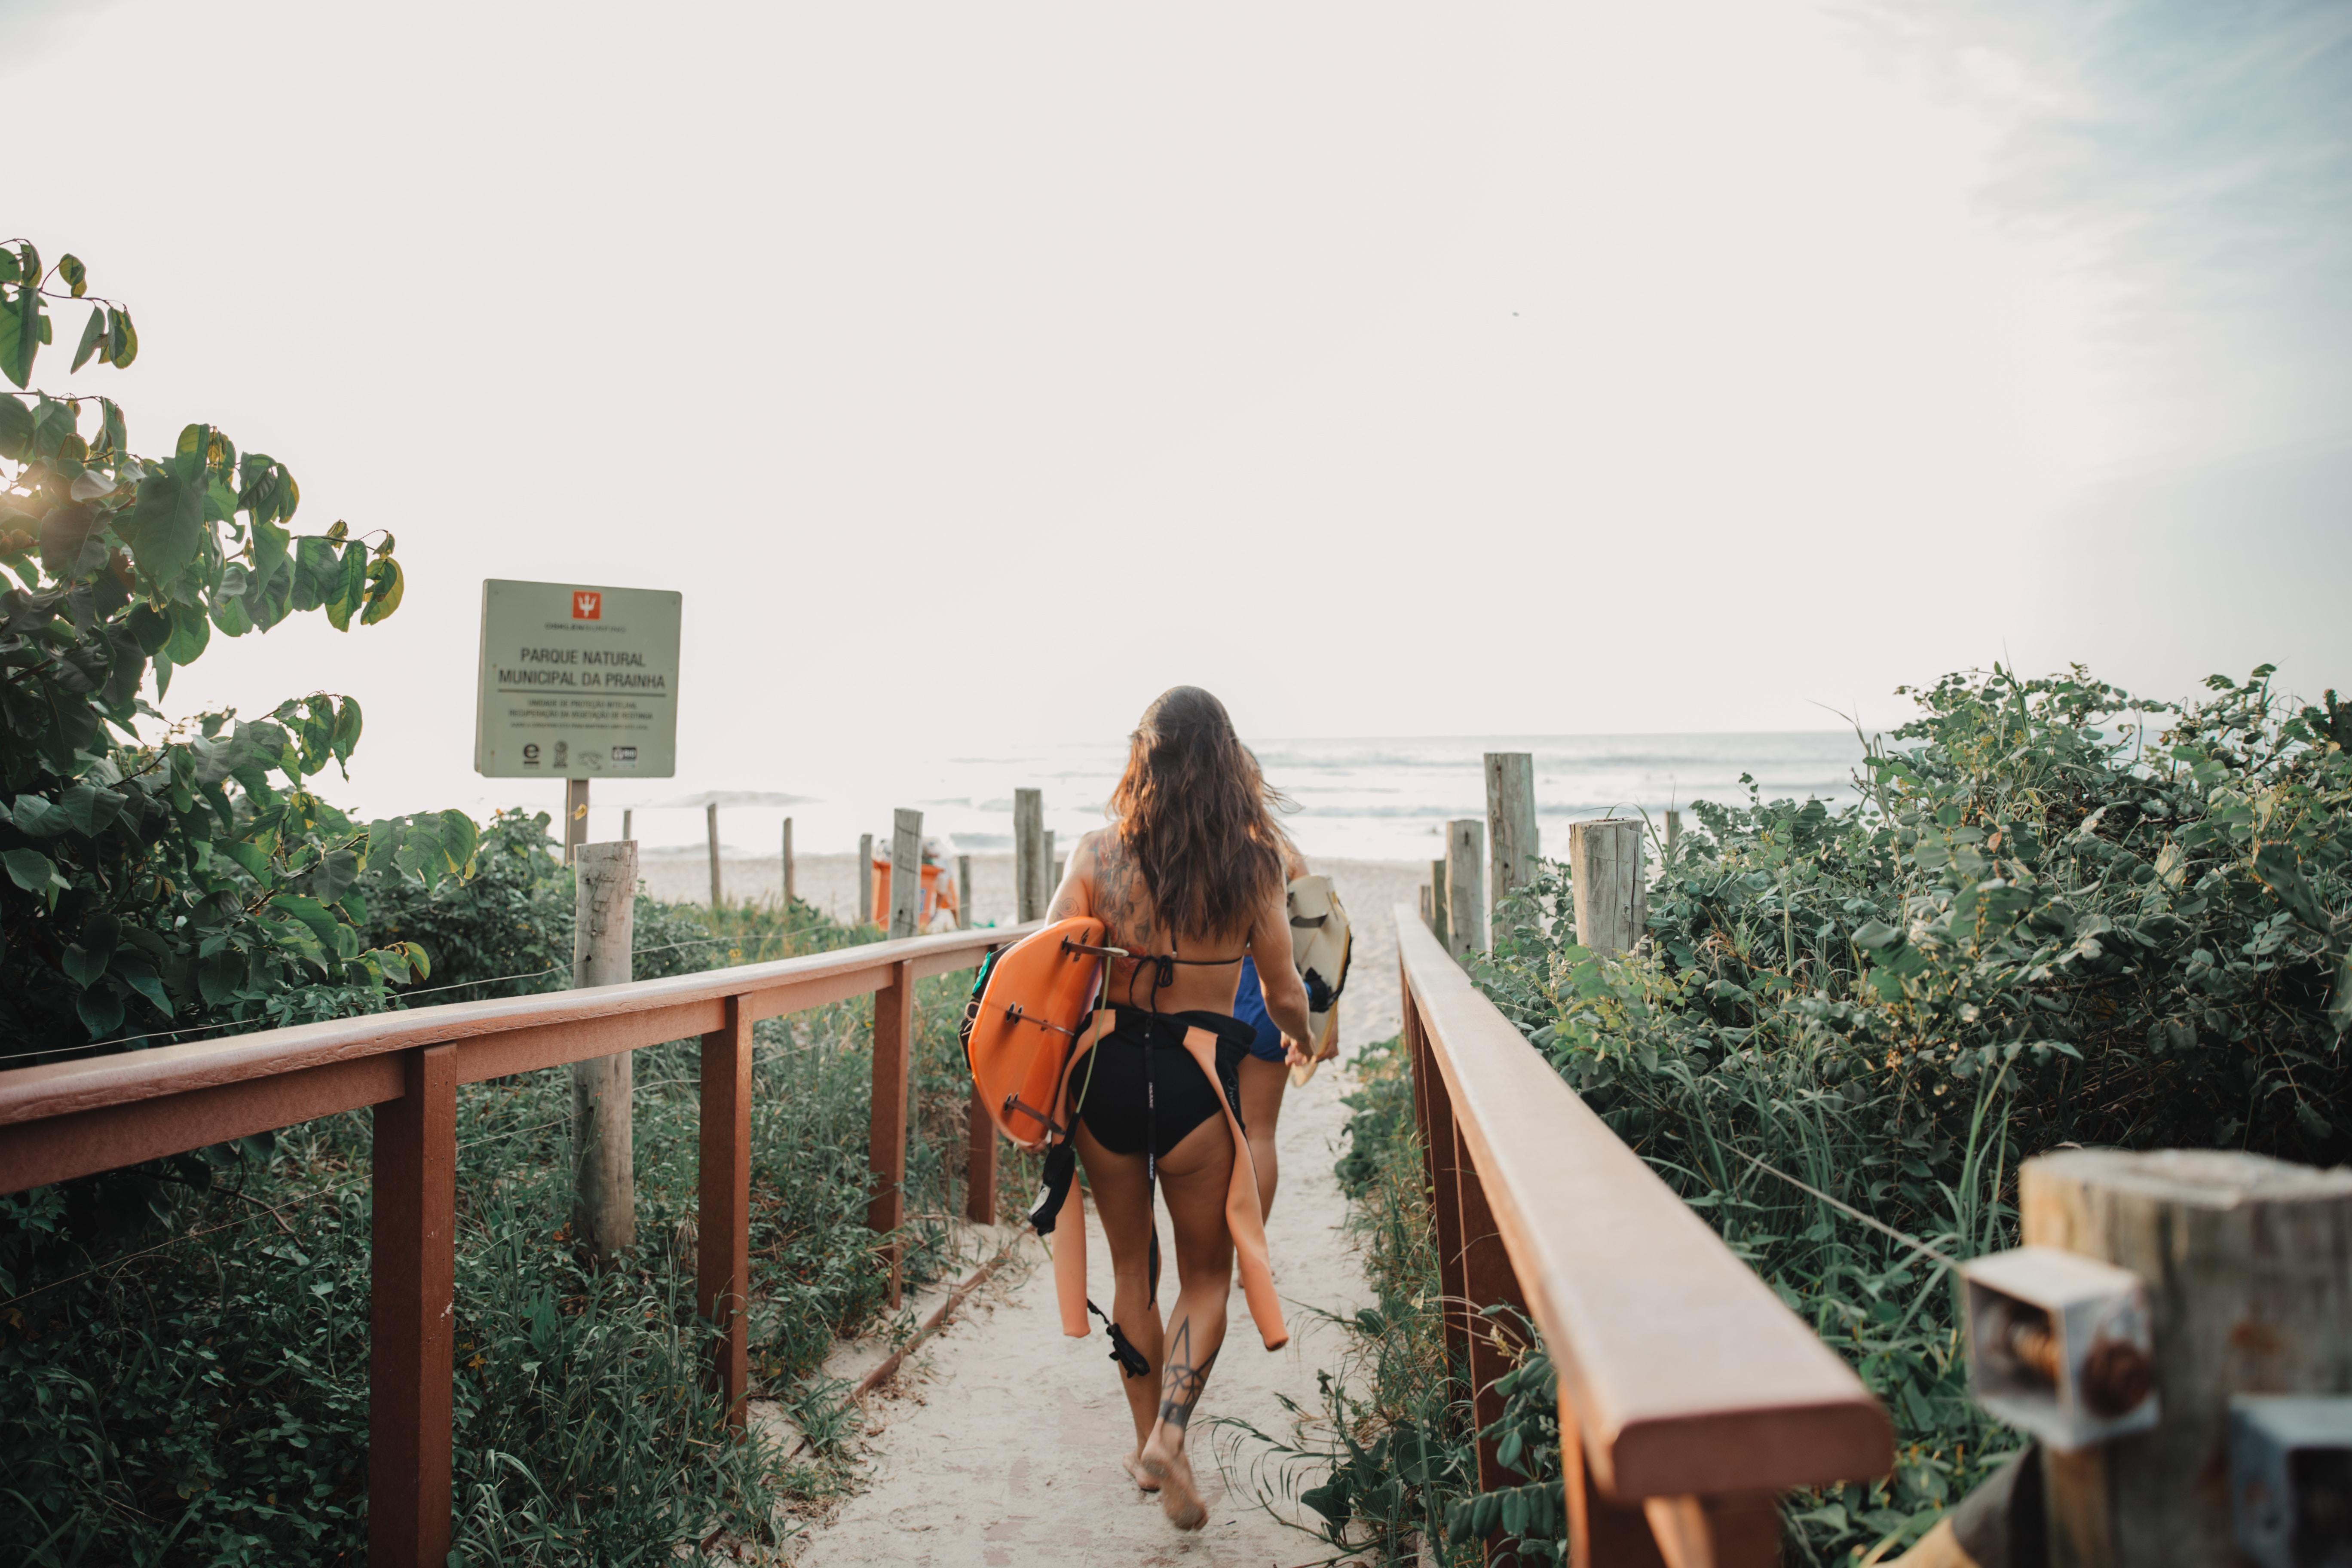 woman wearing pink and black bikini bringing orange surfboard